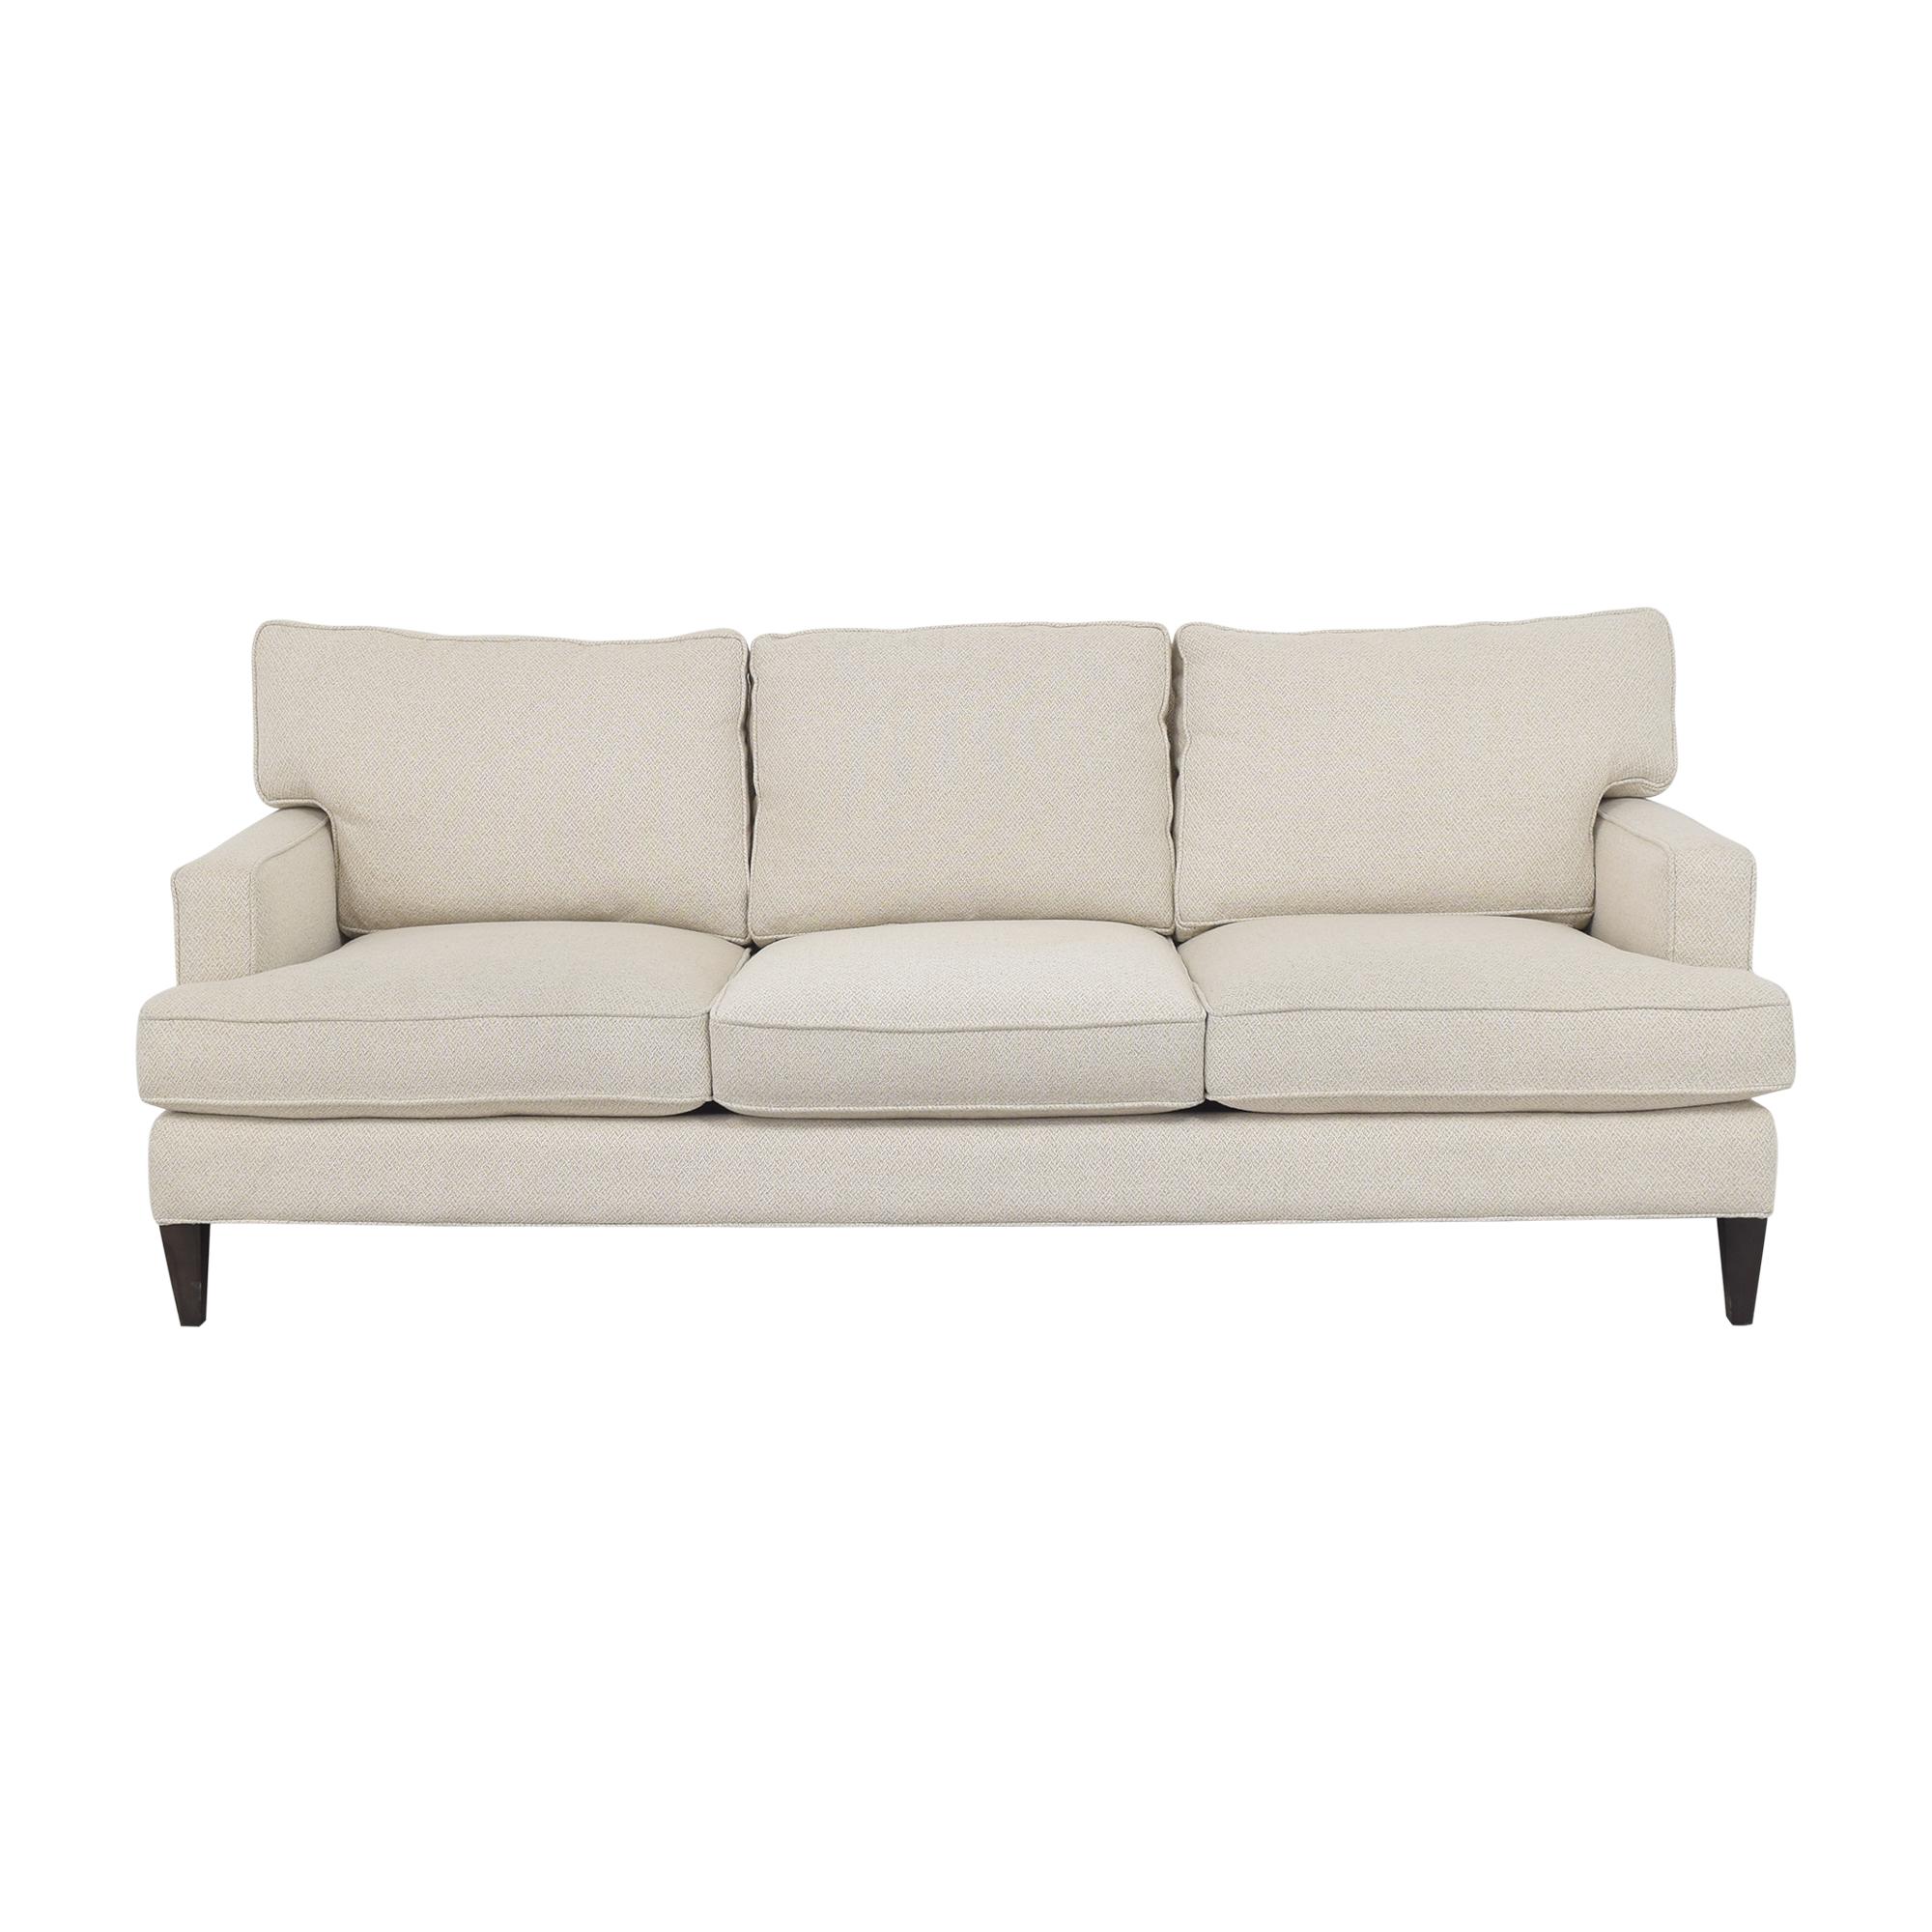 Room & Board Room & Board Seaton Three Cushion Sofa Sofas